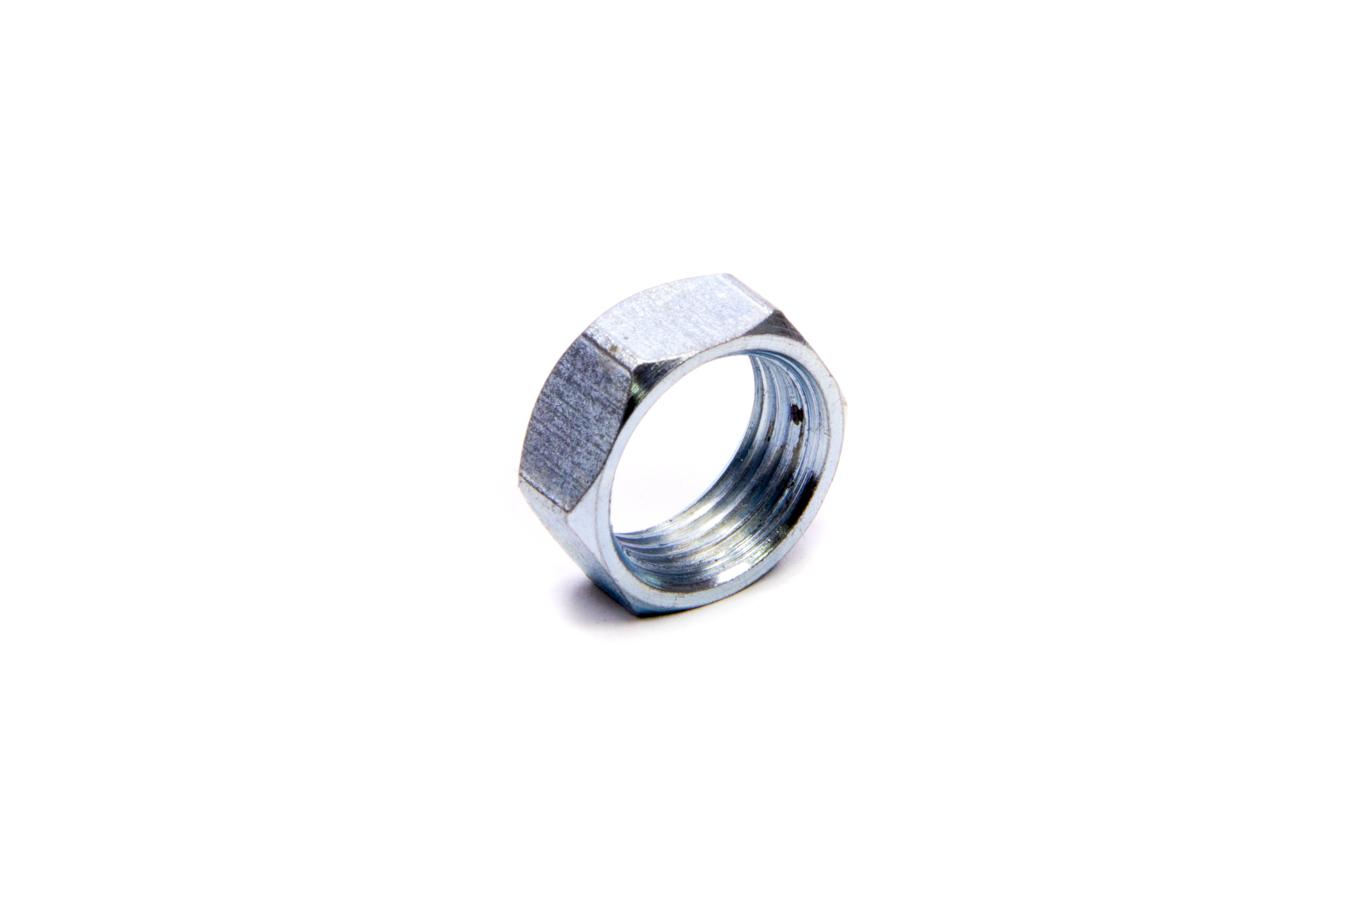 Diversified Machine JAM10 Jam Nut, 5/8-18 in Right Hand Thread, Steel, Zinc Oxide, Each